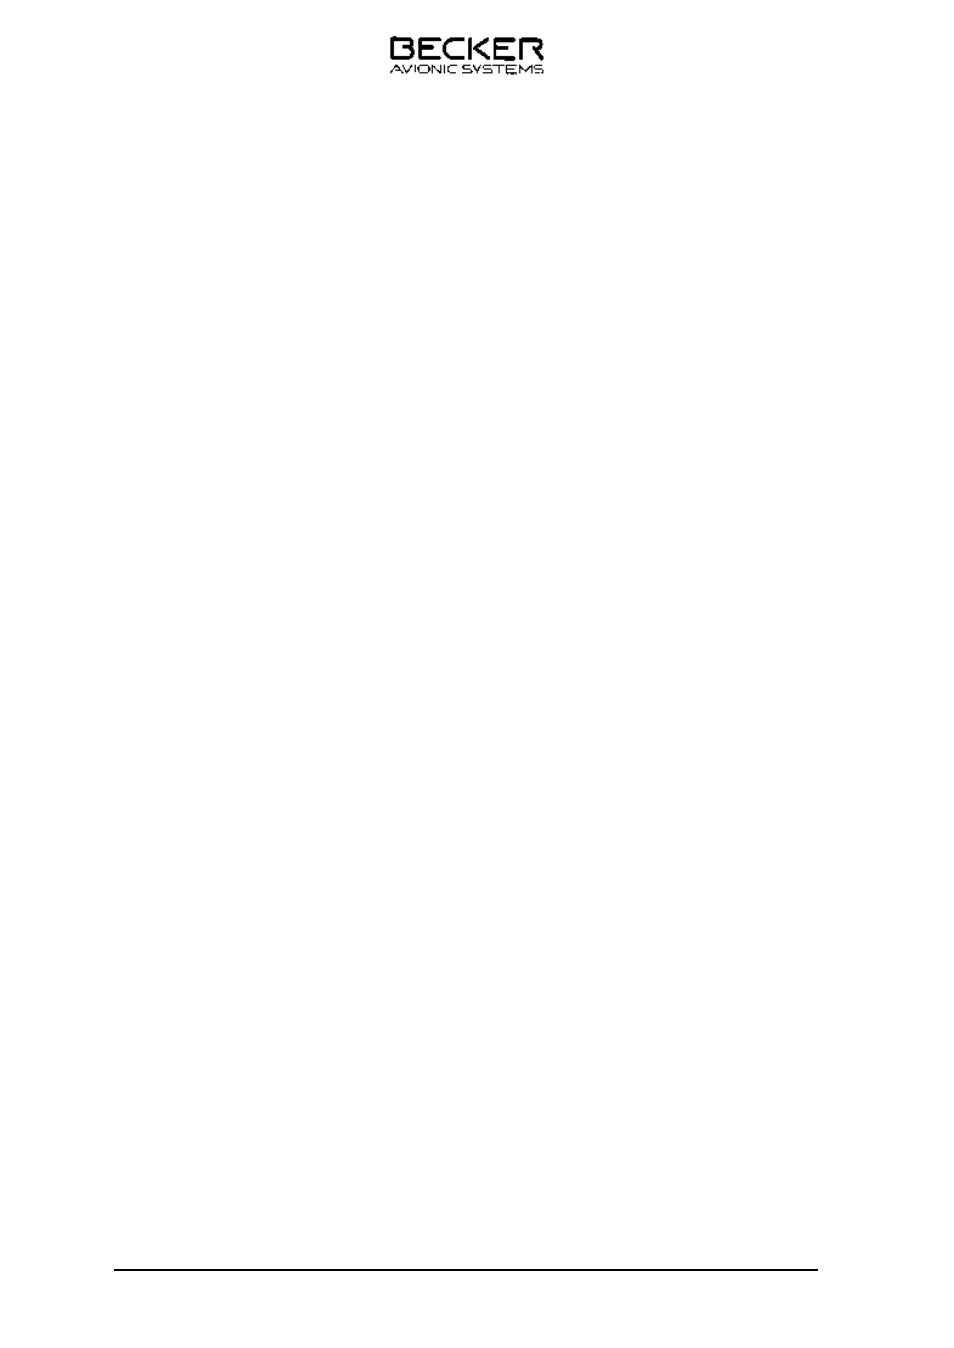 general description becker designed ar 3201 user manual page 6 rh manualsdir com User Manual Template User Manual Template